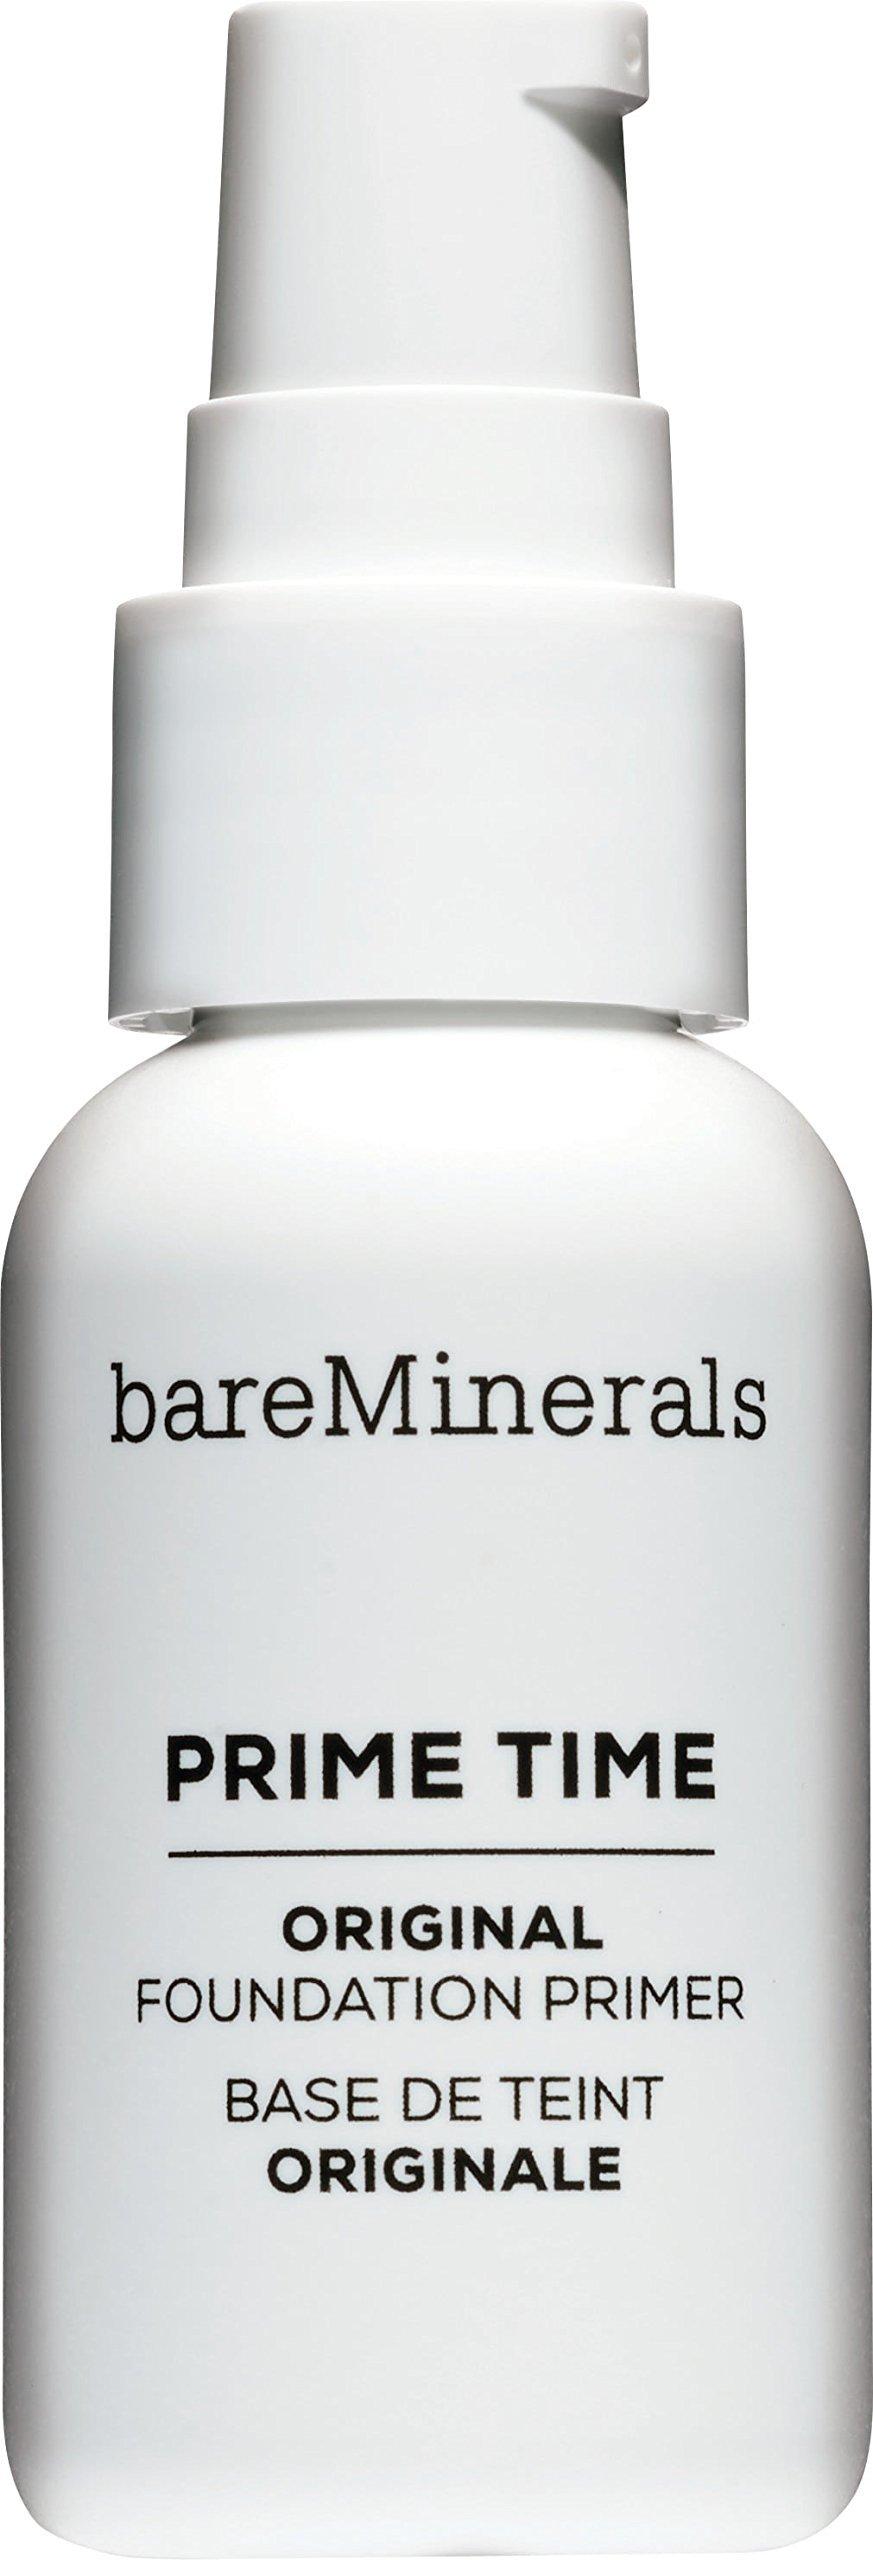 bareMinerals Prime Time Original Face Primer, 1 Ounce